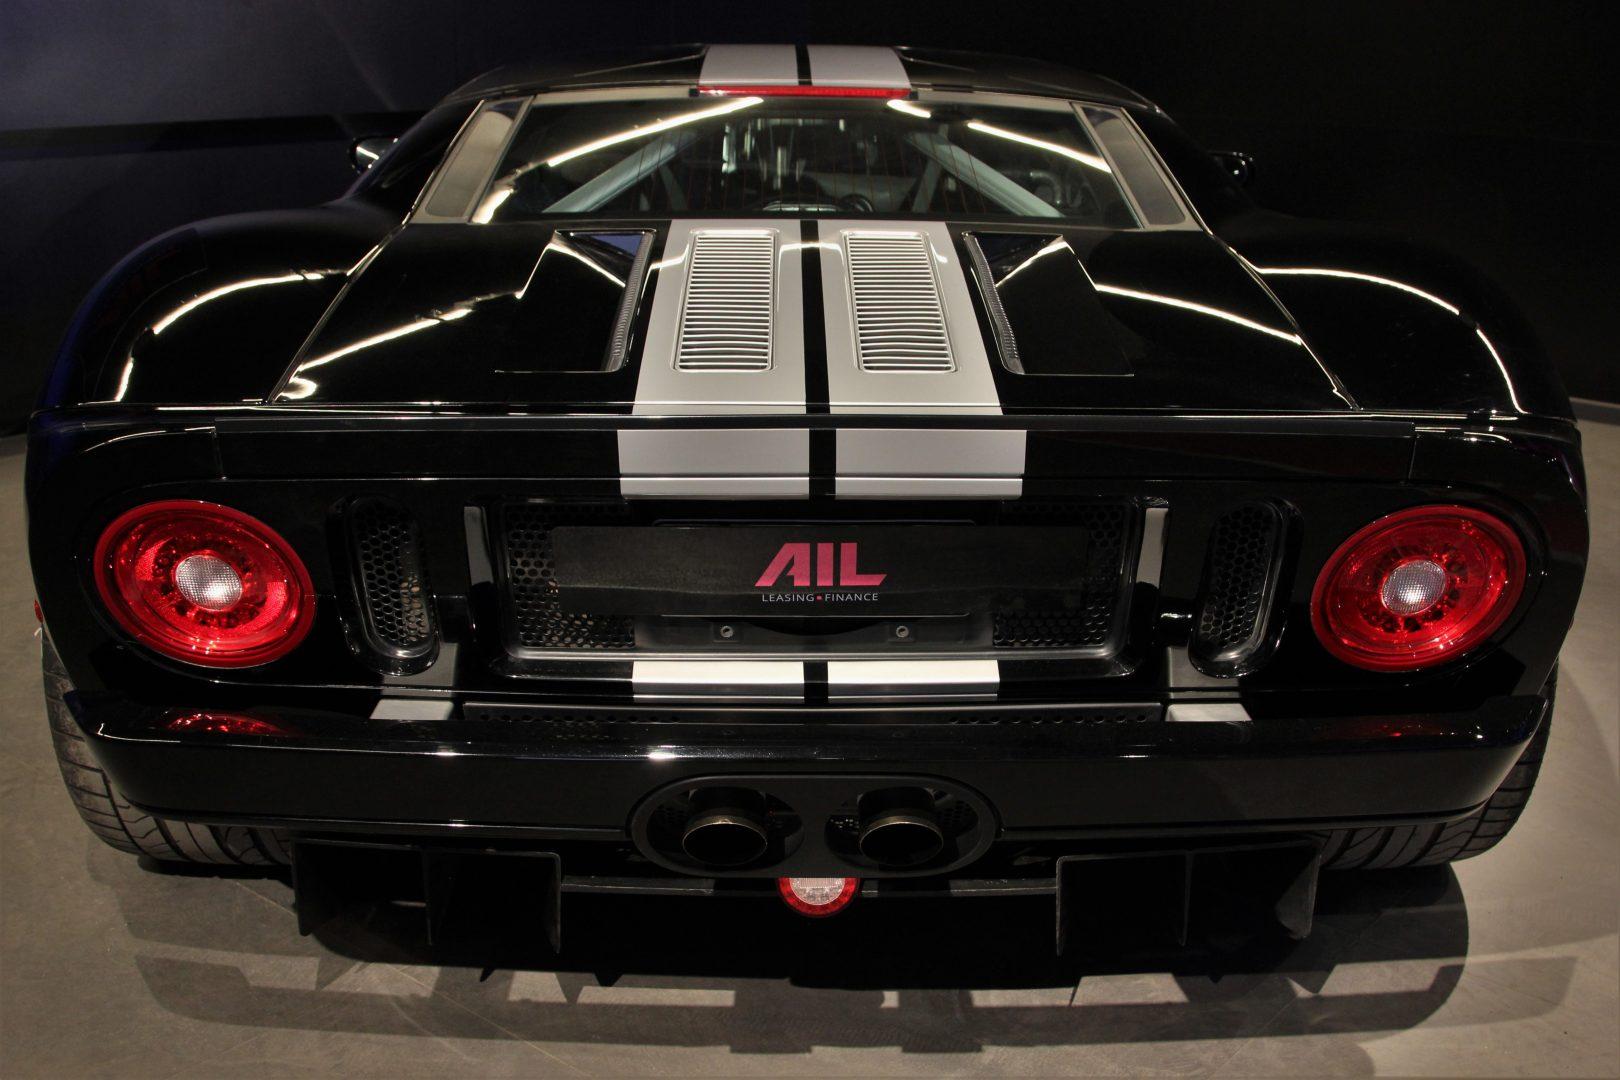 AIL Ford GT 5.4L V8 Supercharger 7